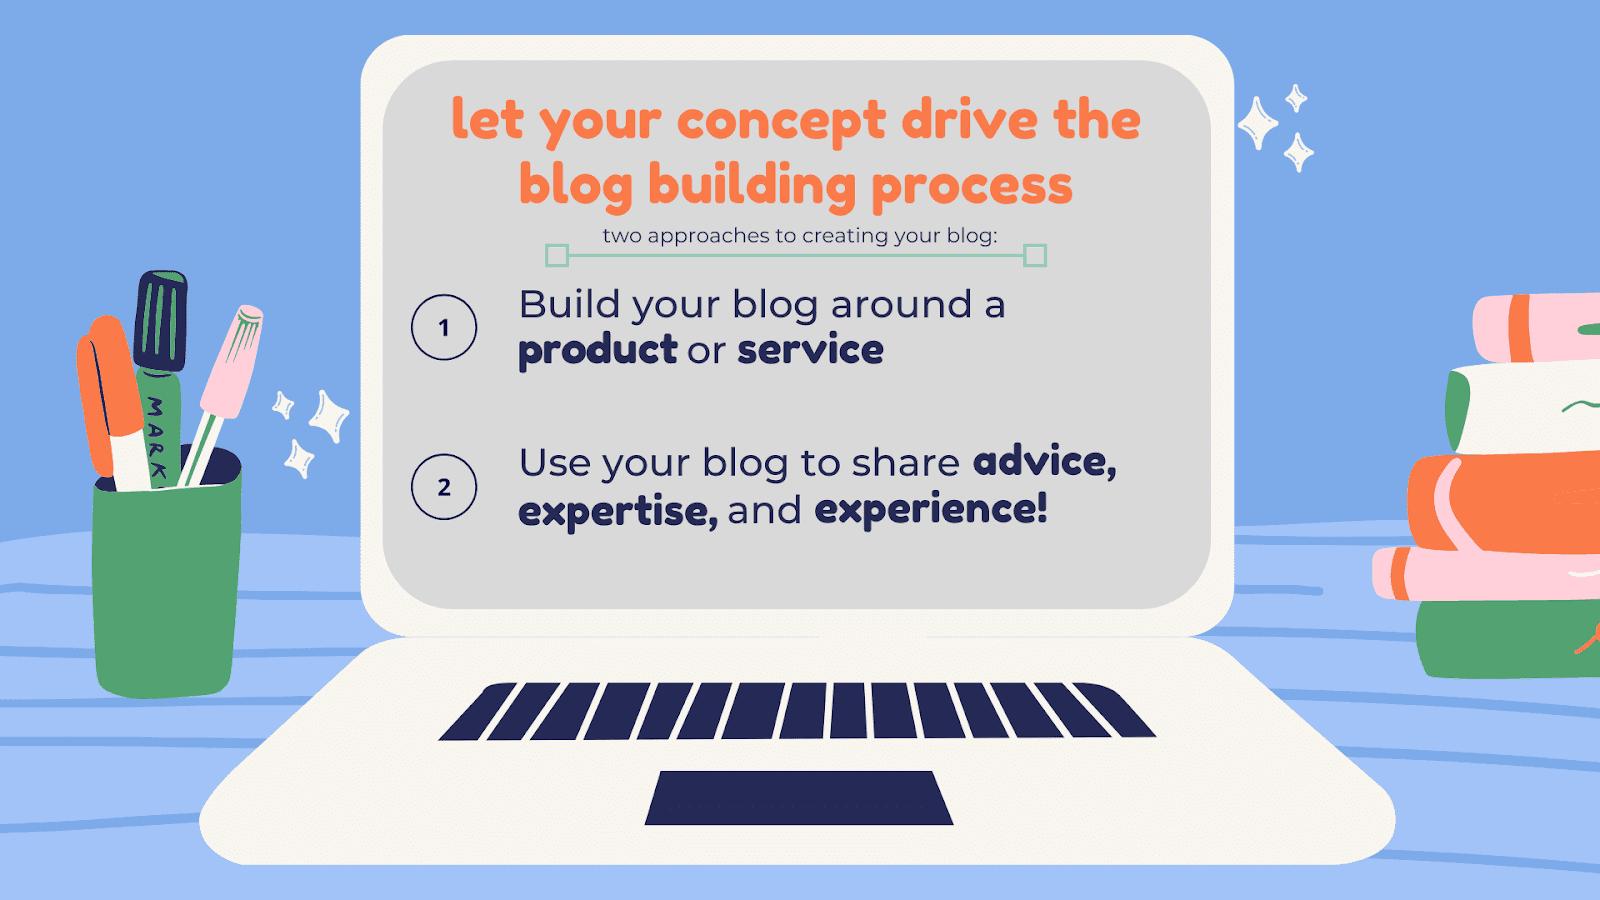 Let your concept drive the building process